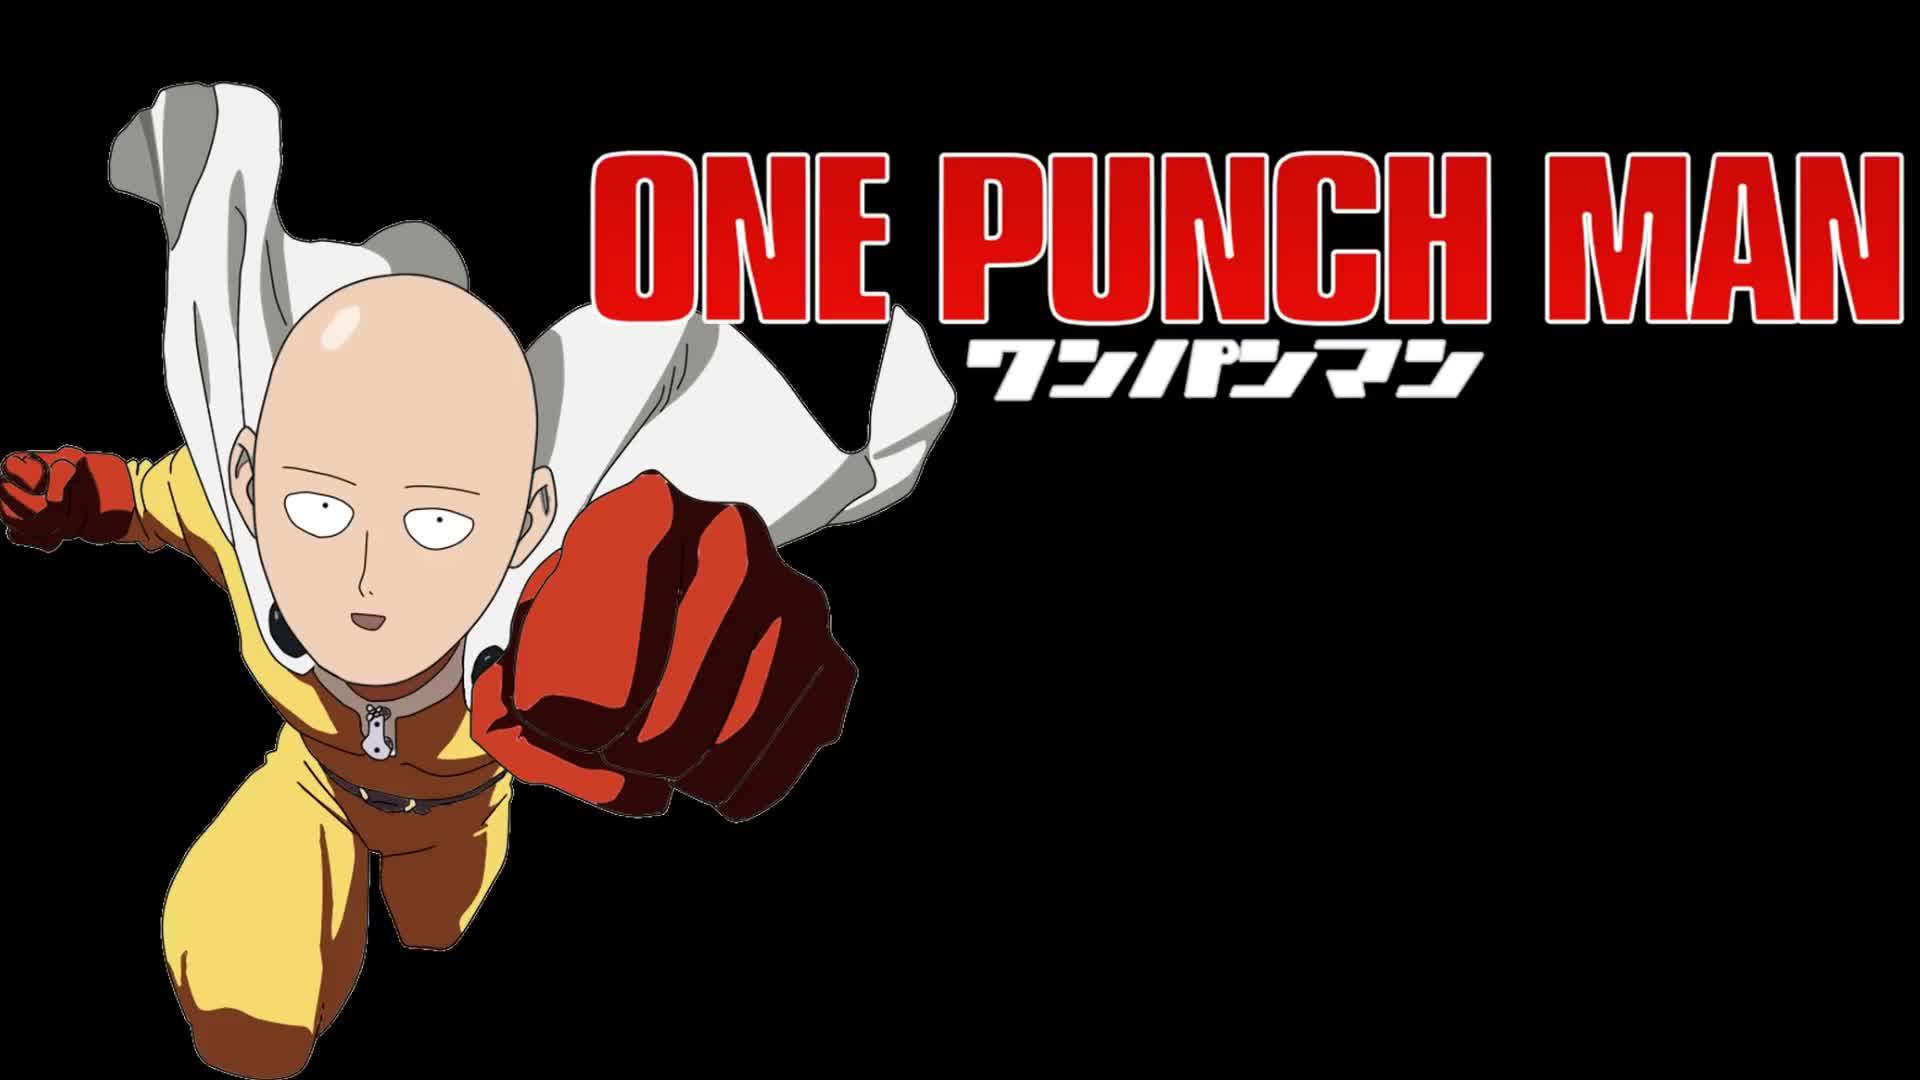 AniUniverse, Film & Animation, One Punch Man, Ванпанчмен, Ванпанчмен / OnePunchMan, Опенинг 2 Сезона, Это 1 опенинг 2 сезона Ванпанчмена, Ванпанчмен / OnePunchMan Опенинг 2 Сезона 1080p GIFs